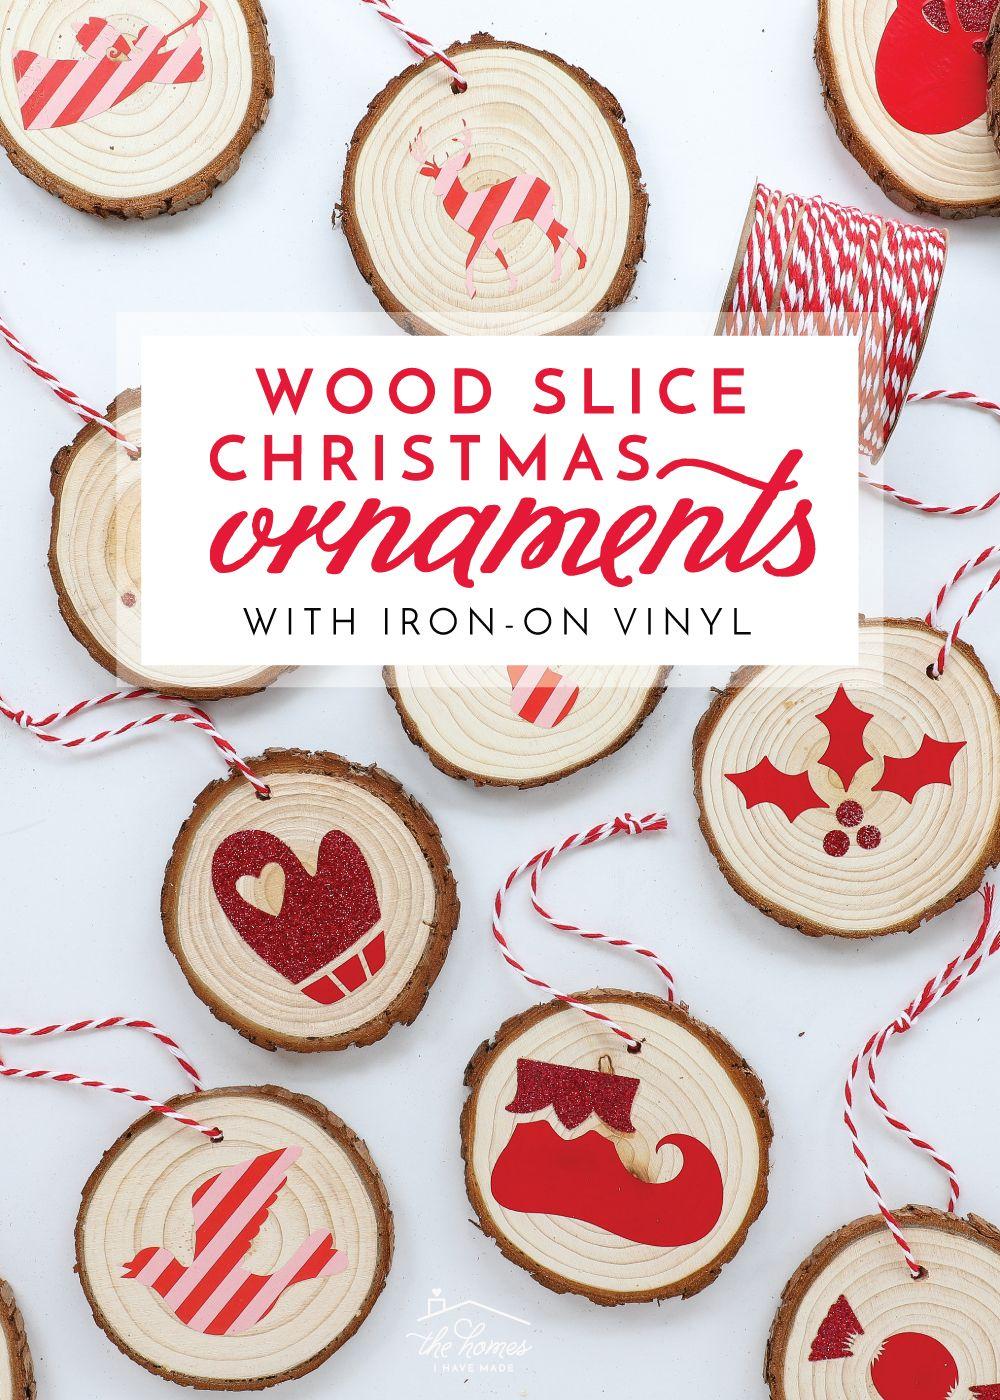 DIY Wood Slice Christmas Ornaments with IronOn Vinyl